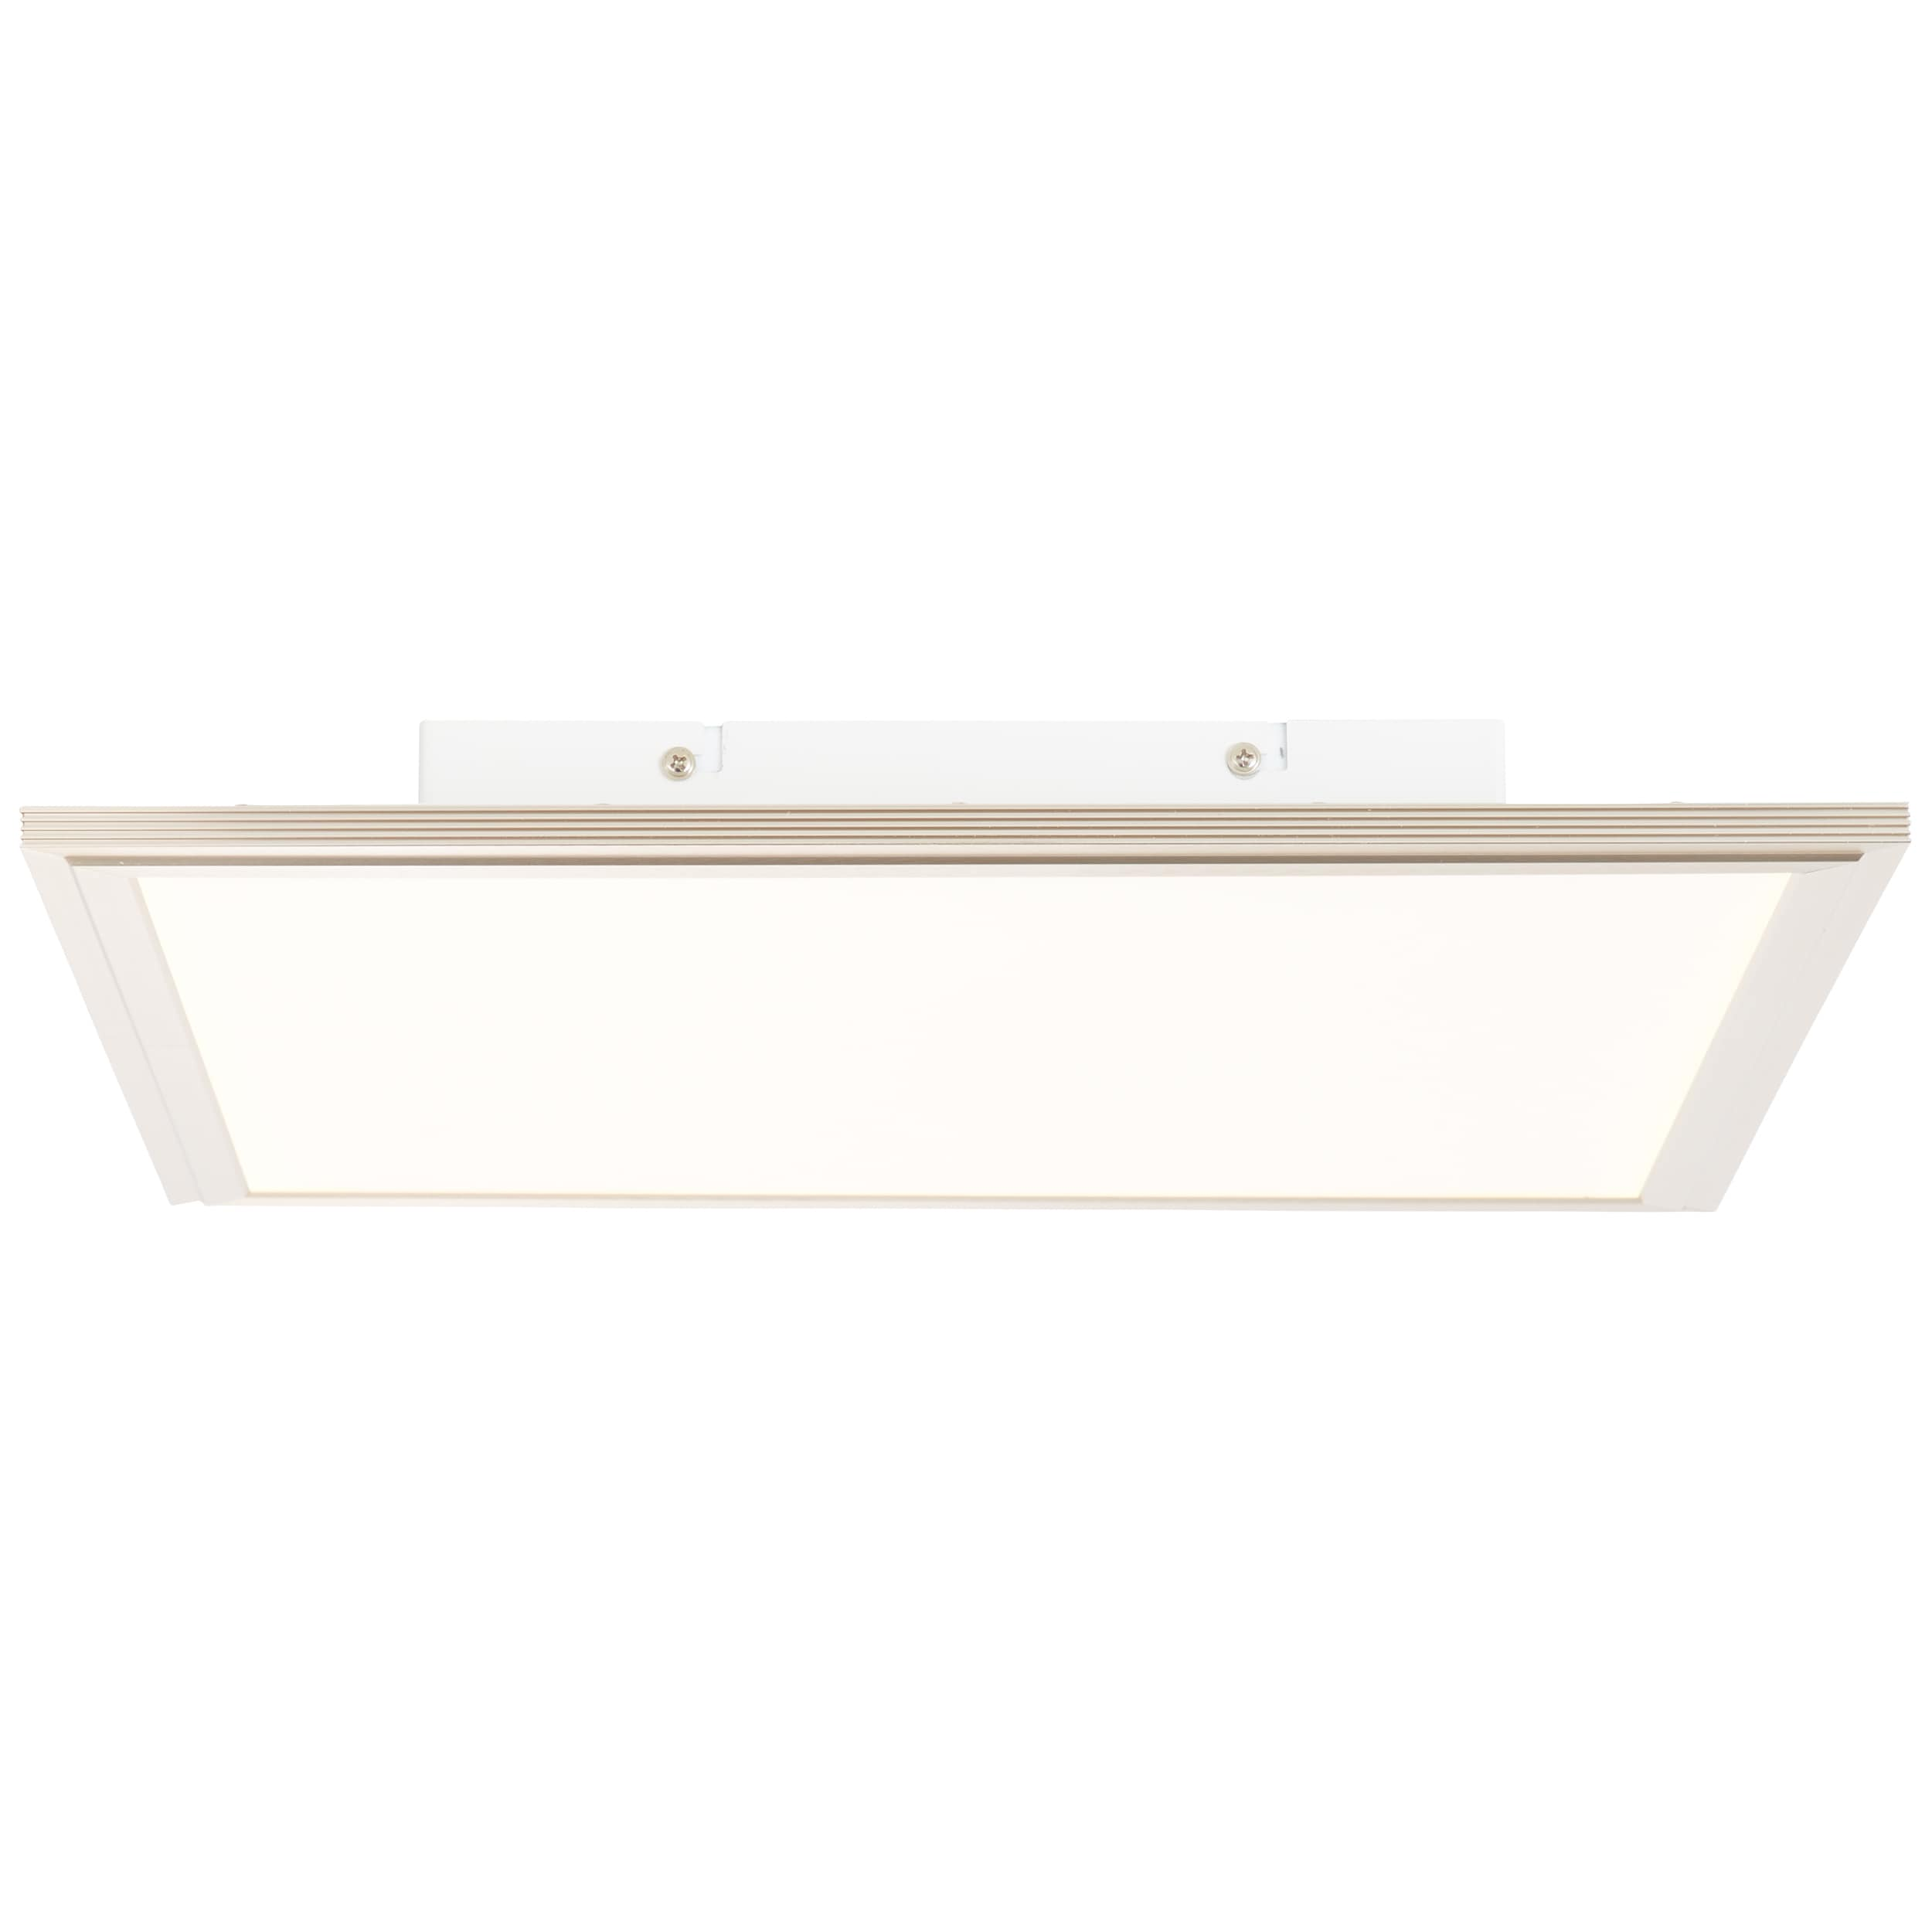 AEG Bendix LED Deckenaufbau-Paneel 42x42cm Tageslichtsensor nickel